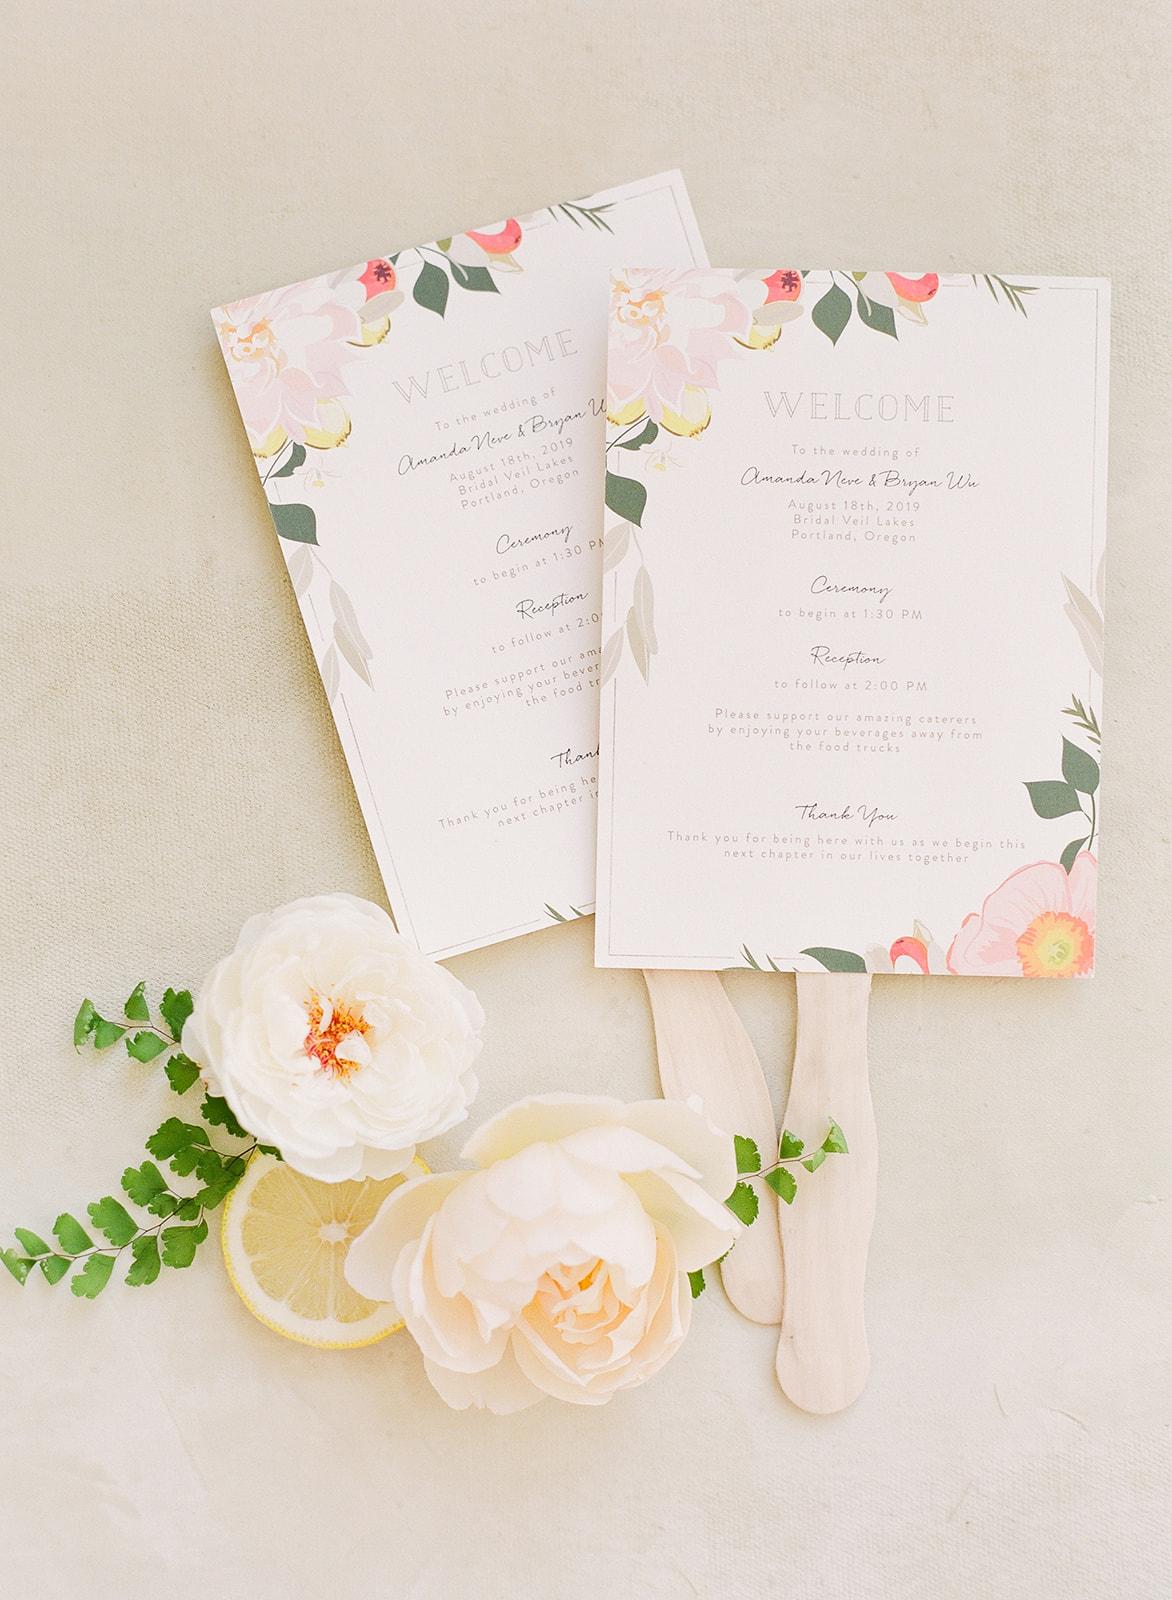 2019 Bryan + Amanda Wedding - 018.jpg